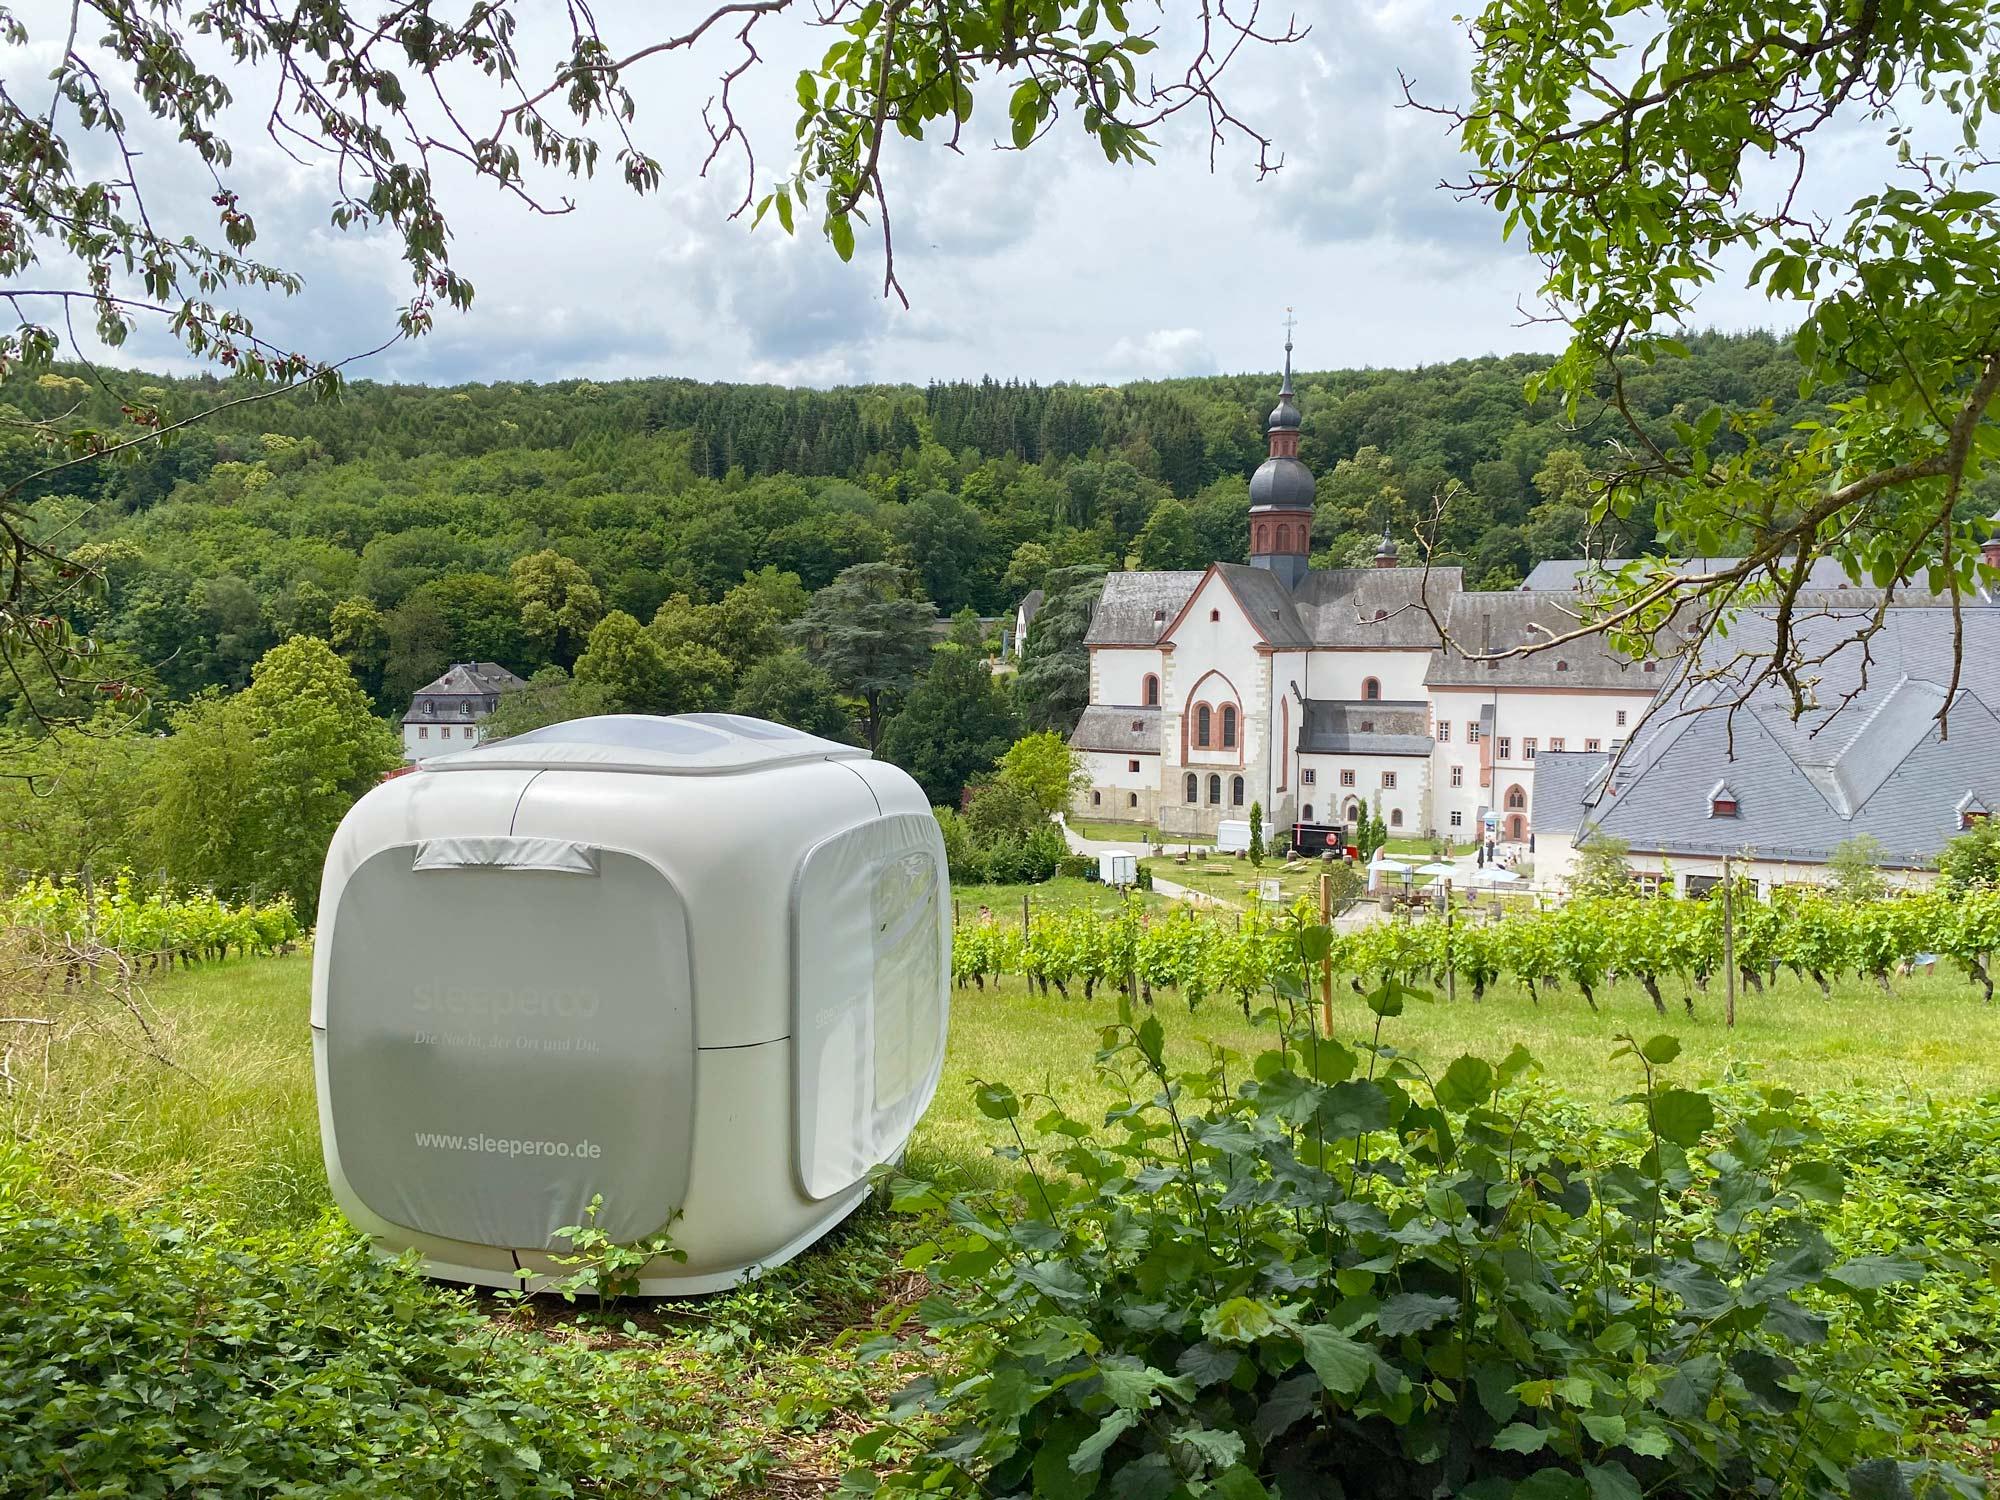 sleeperoo am Kloster Eberbach © Stiftung Kloster Eberbach